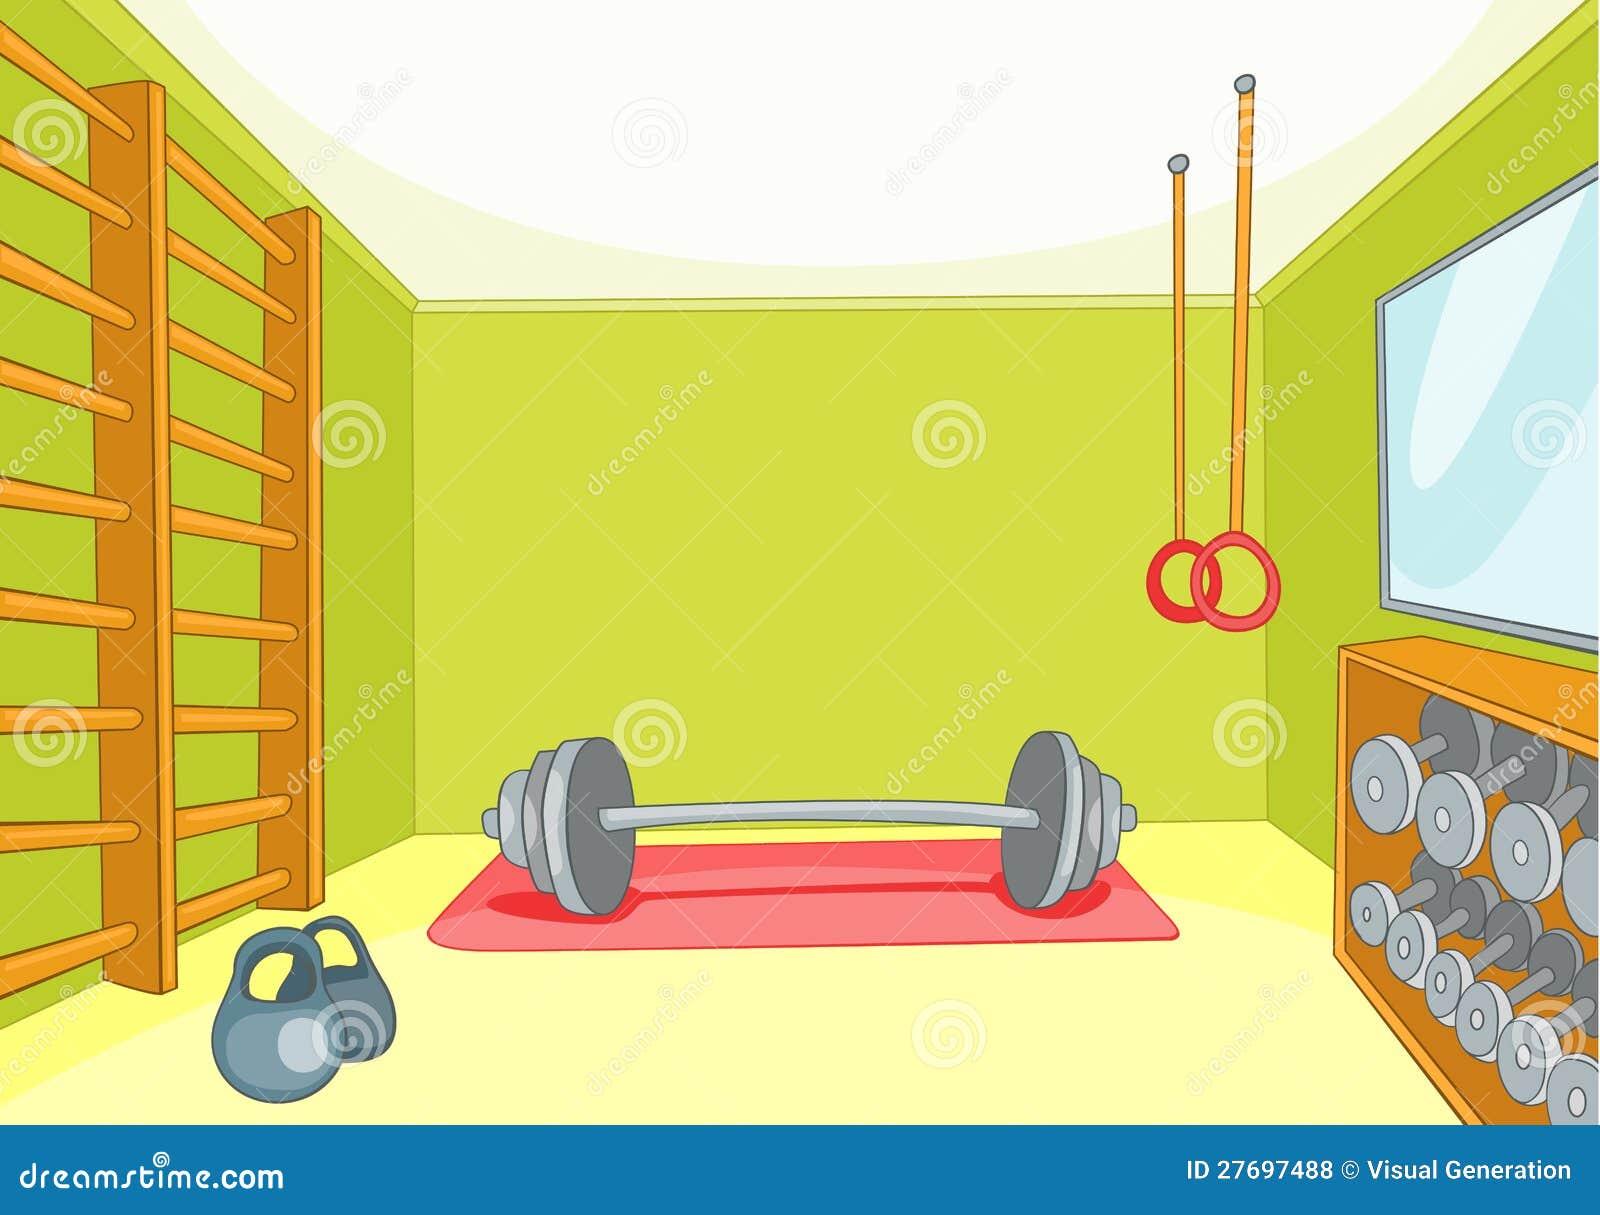 Gym room royalty free stock photos image